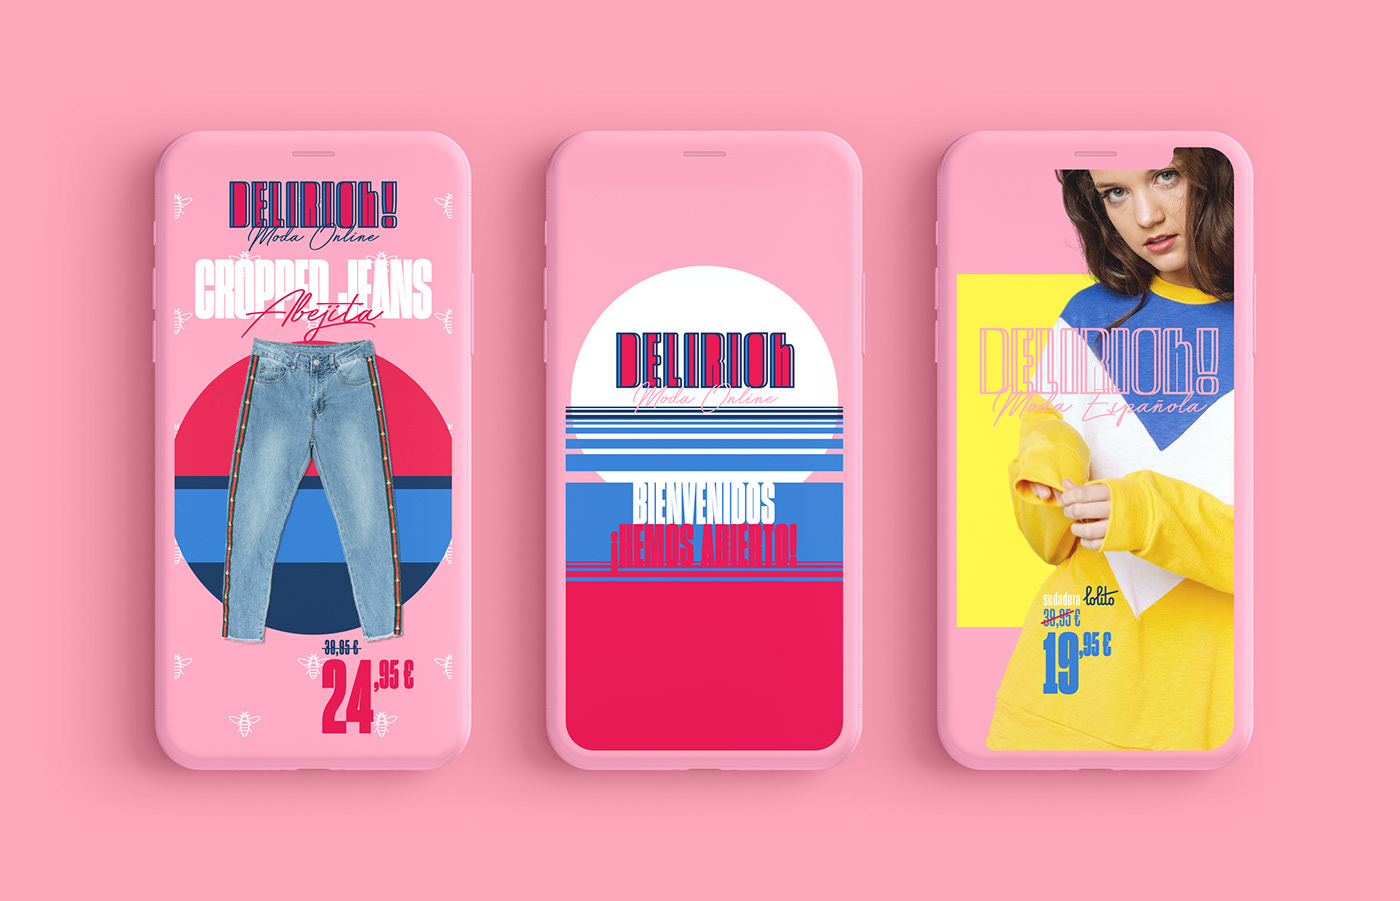 moda Mode boutique tienda online shop Ropa Clothing